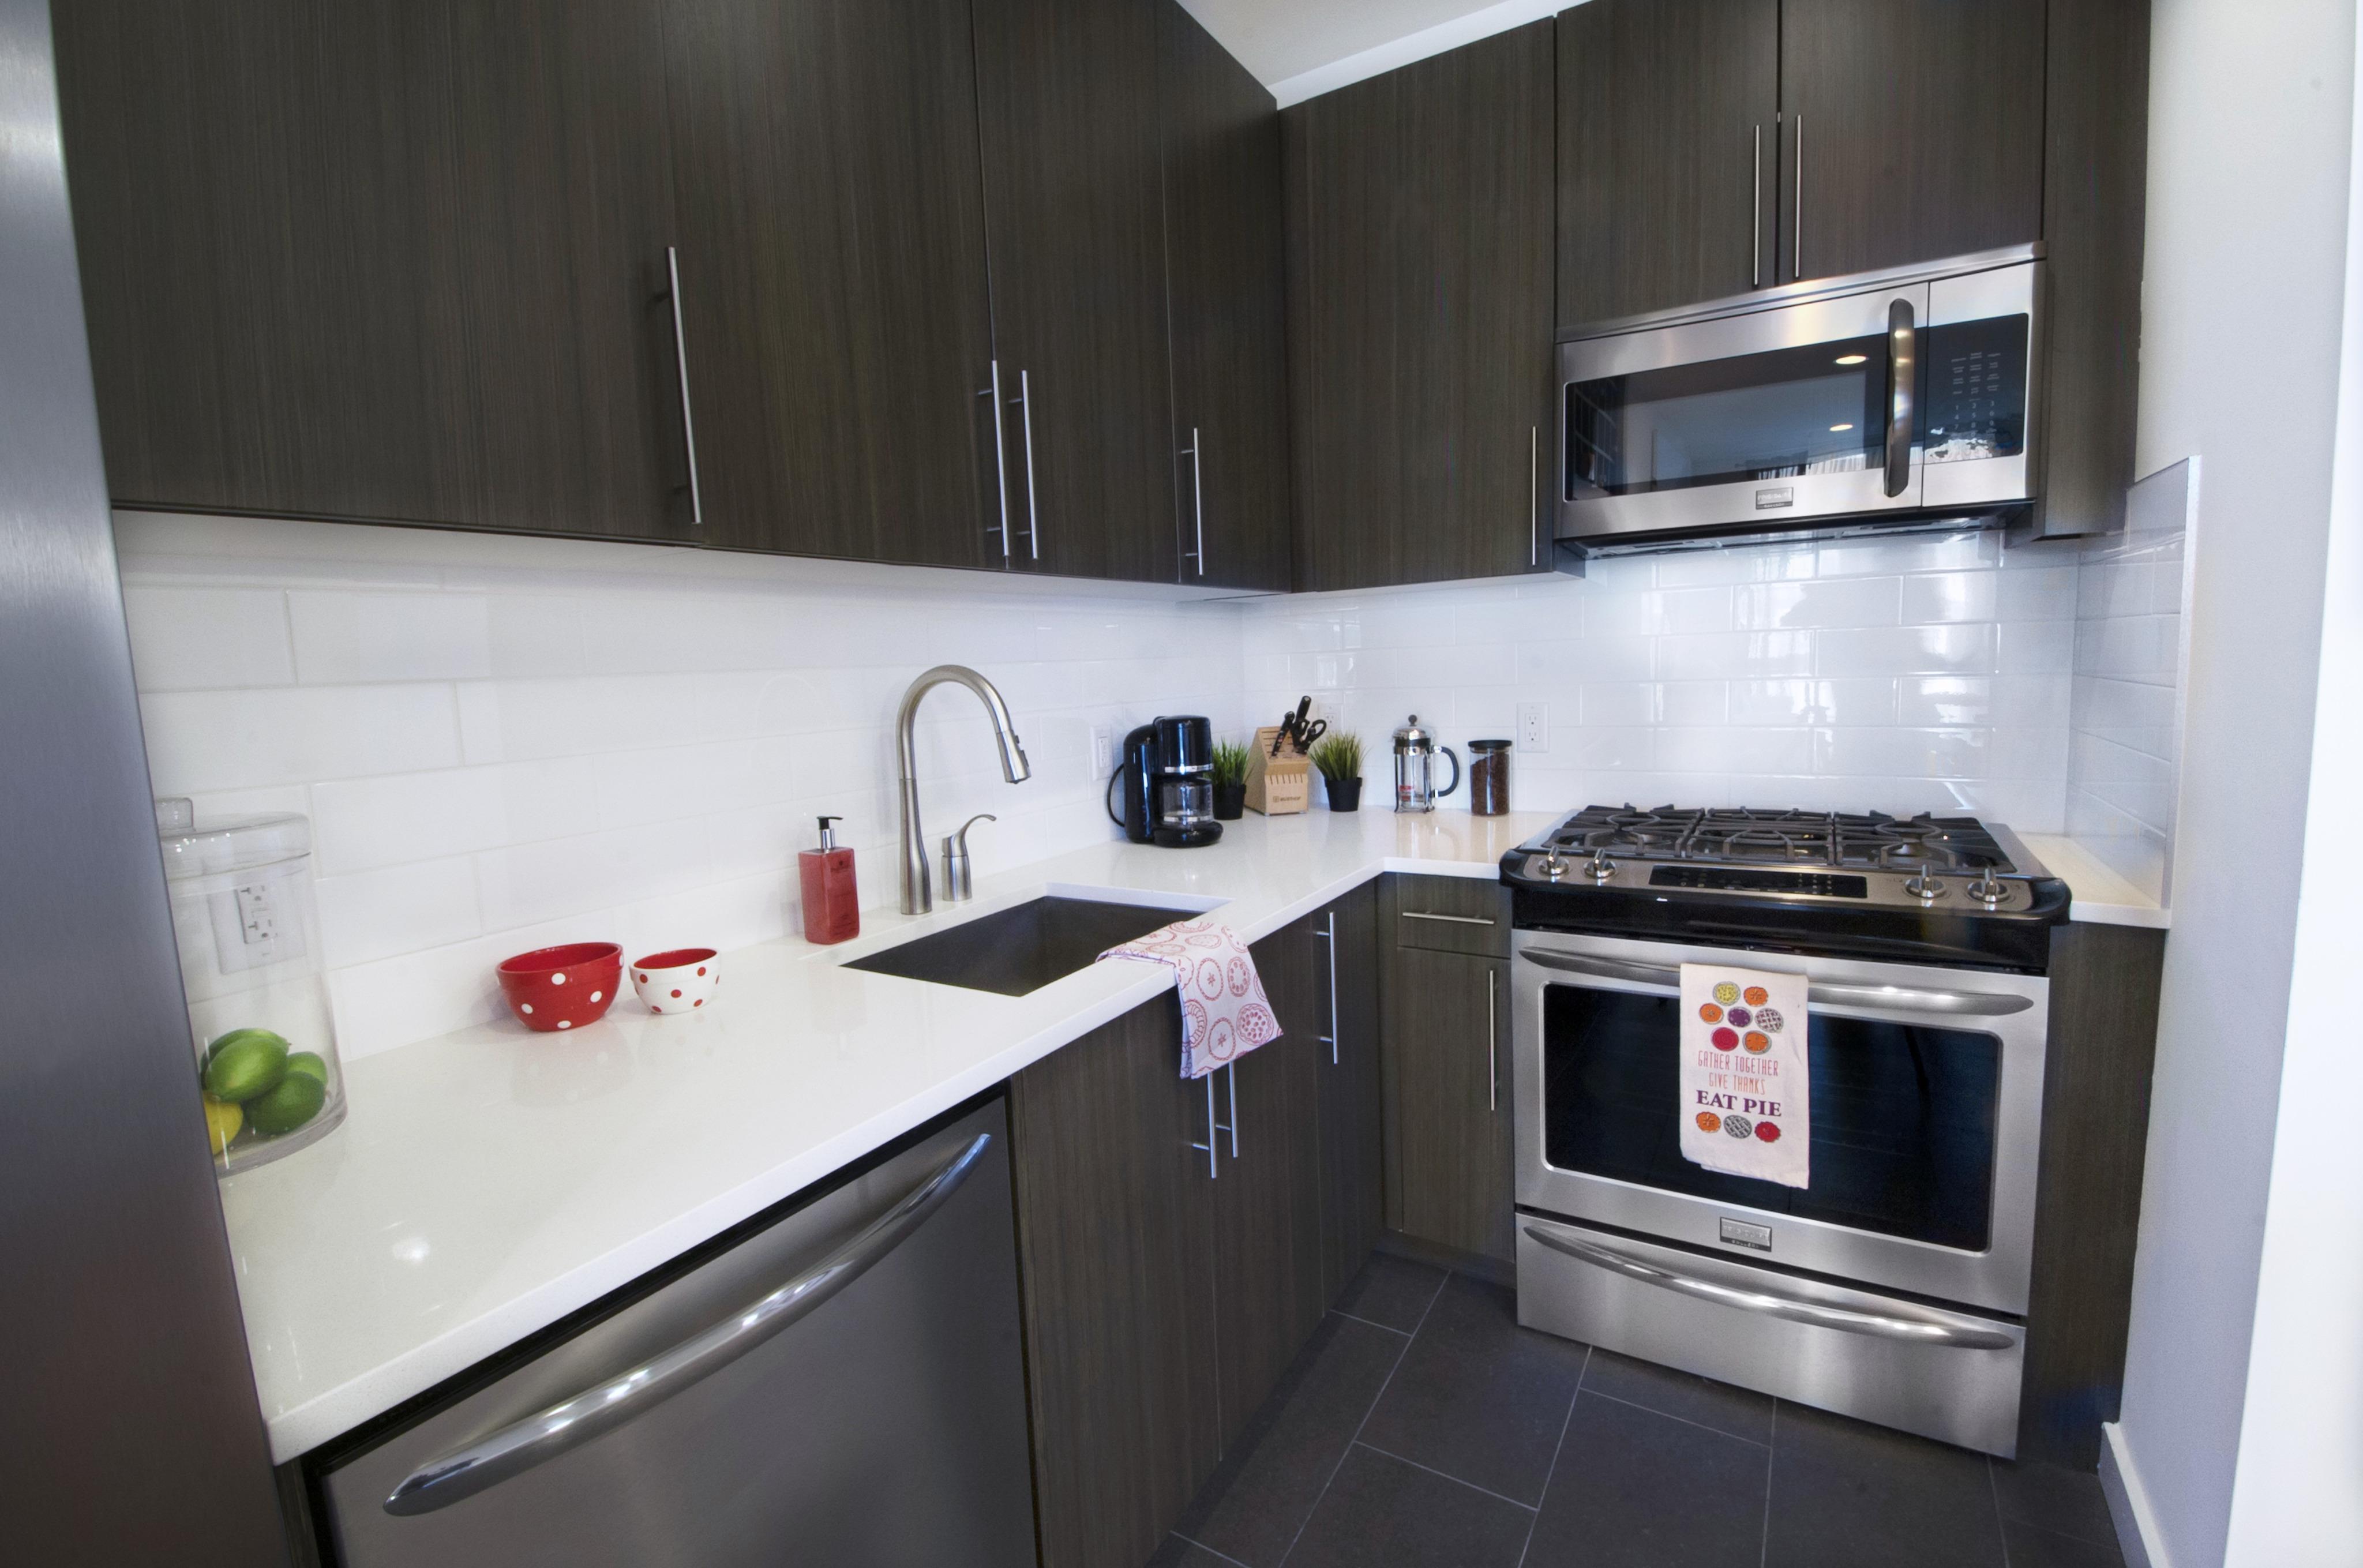 Apartments in HOBOKEN For Rent 1125 Jefferson